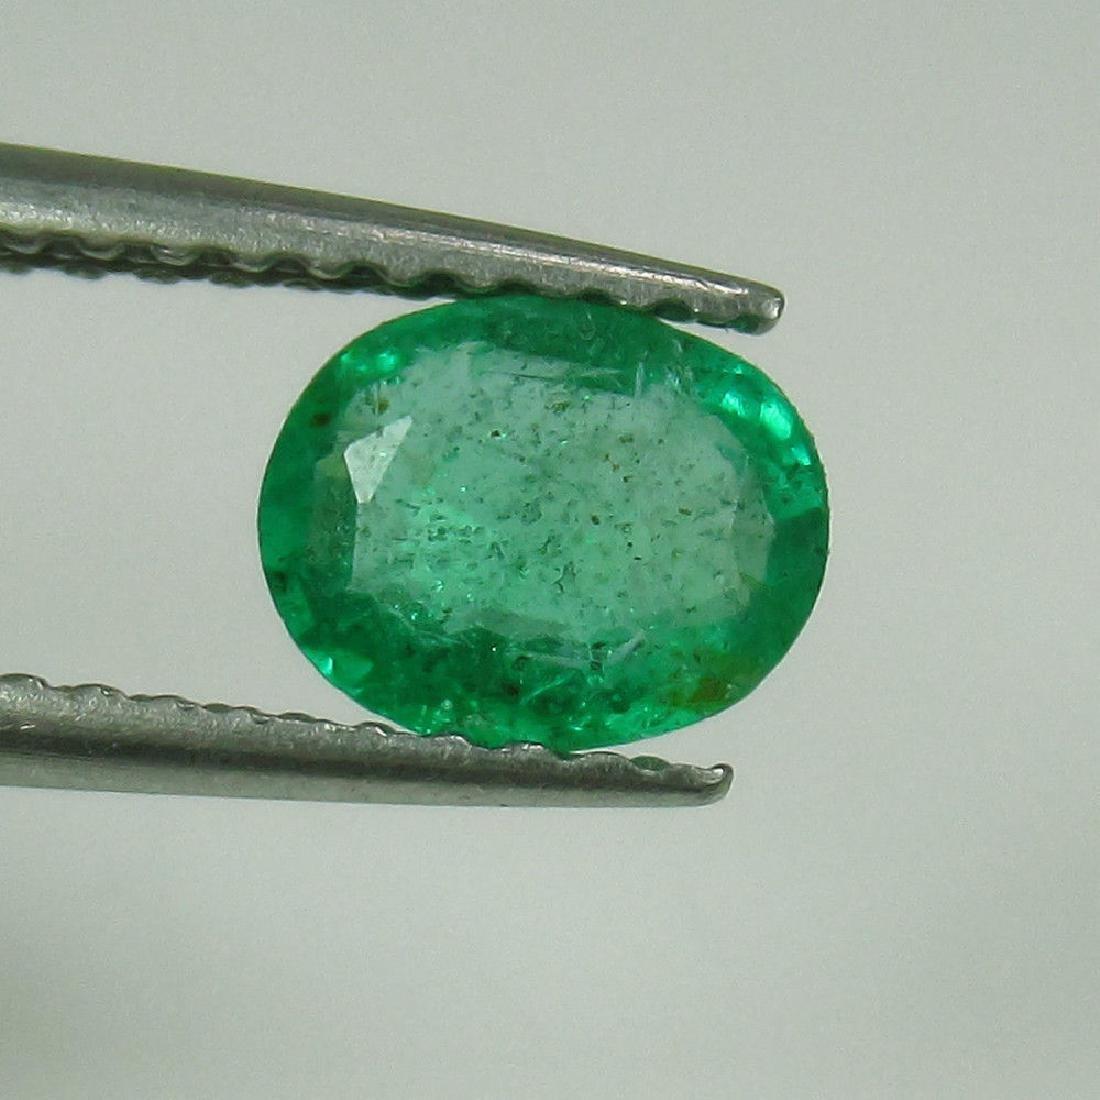 0.61 Ct Genuine Zambian Emerald Nice Oval Cut